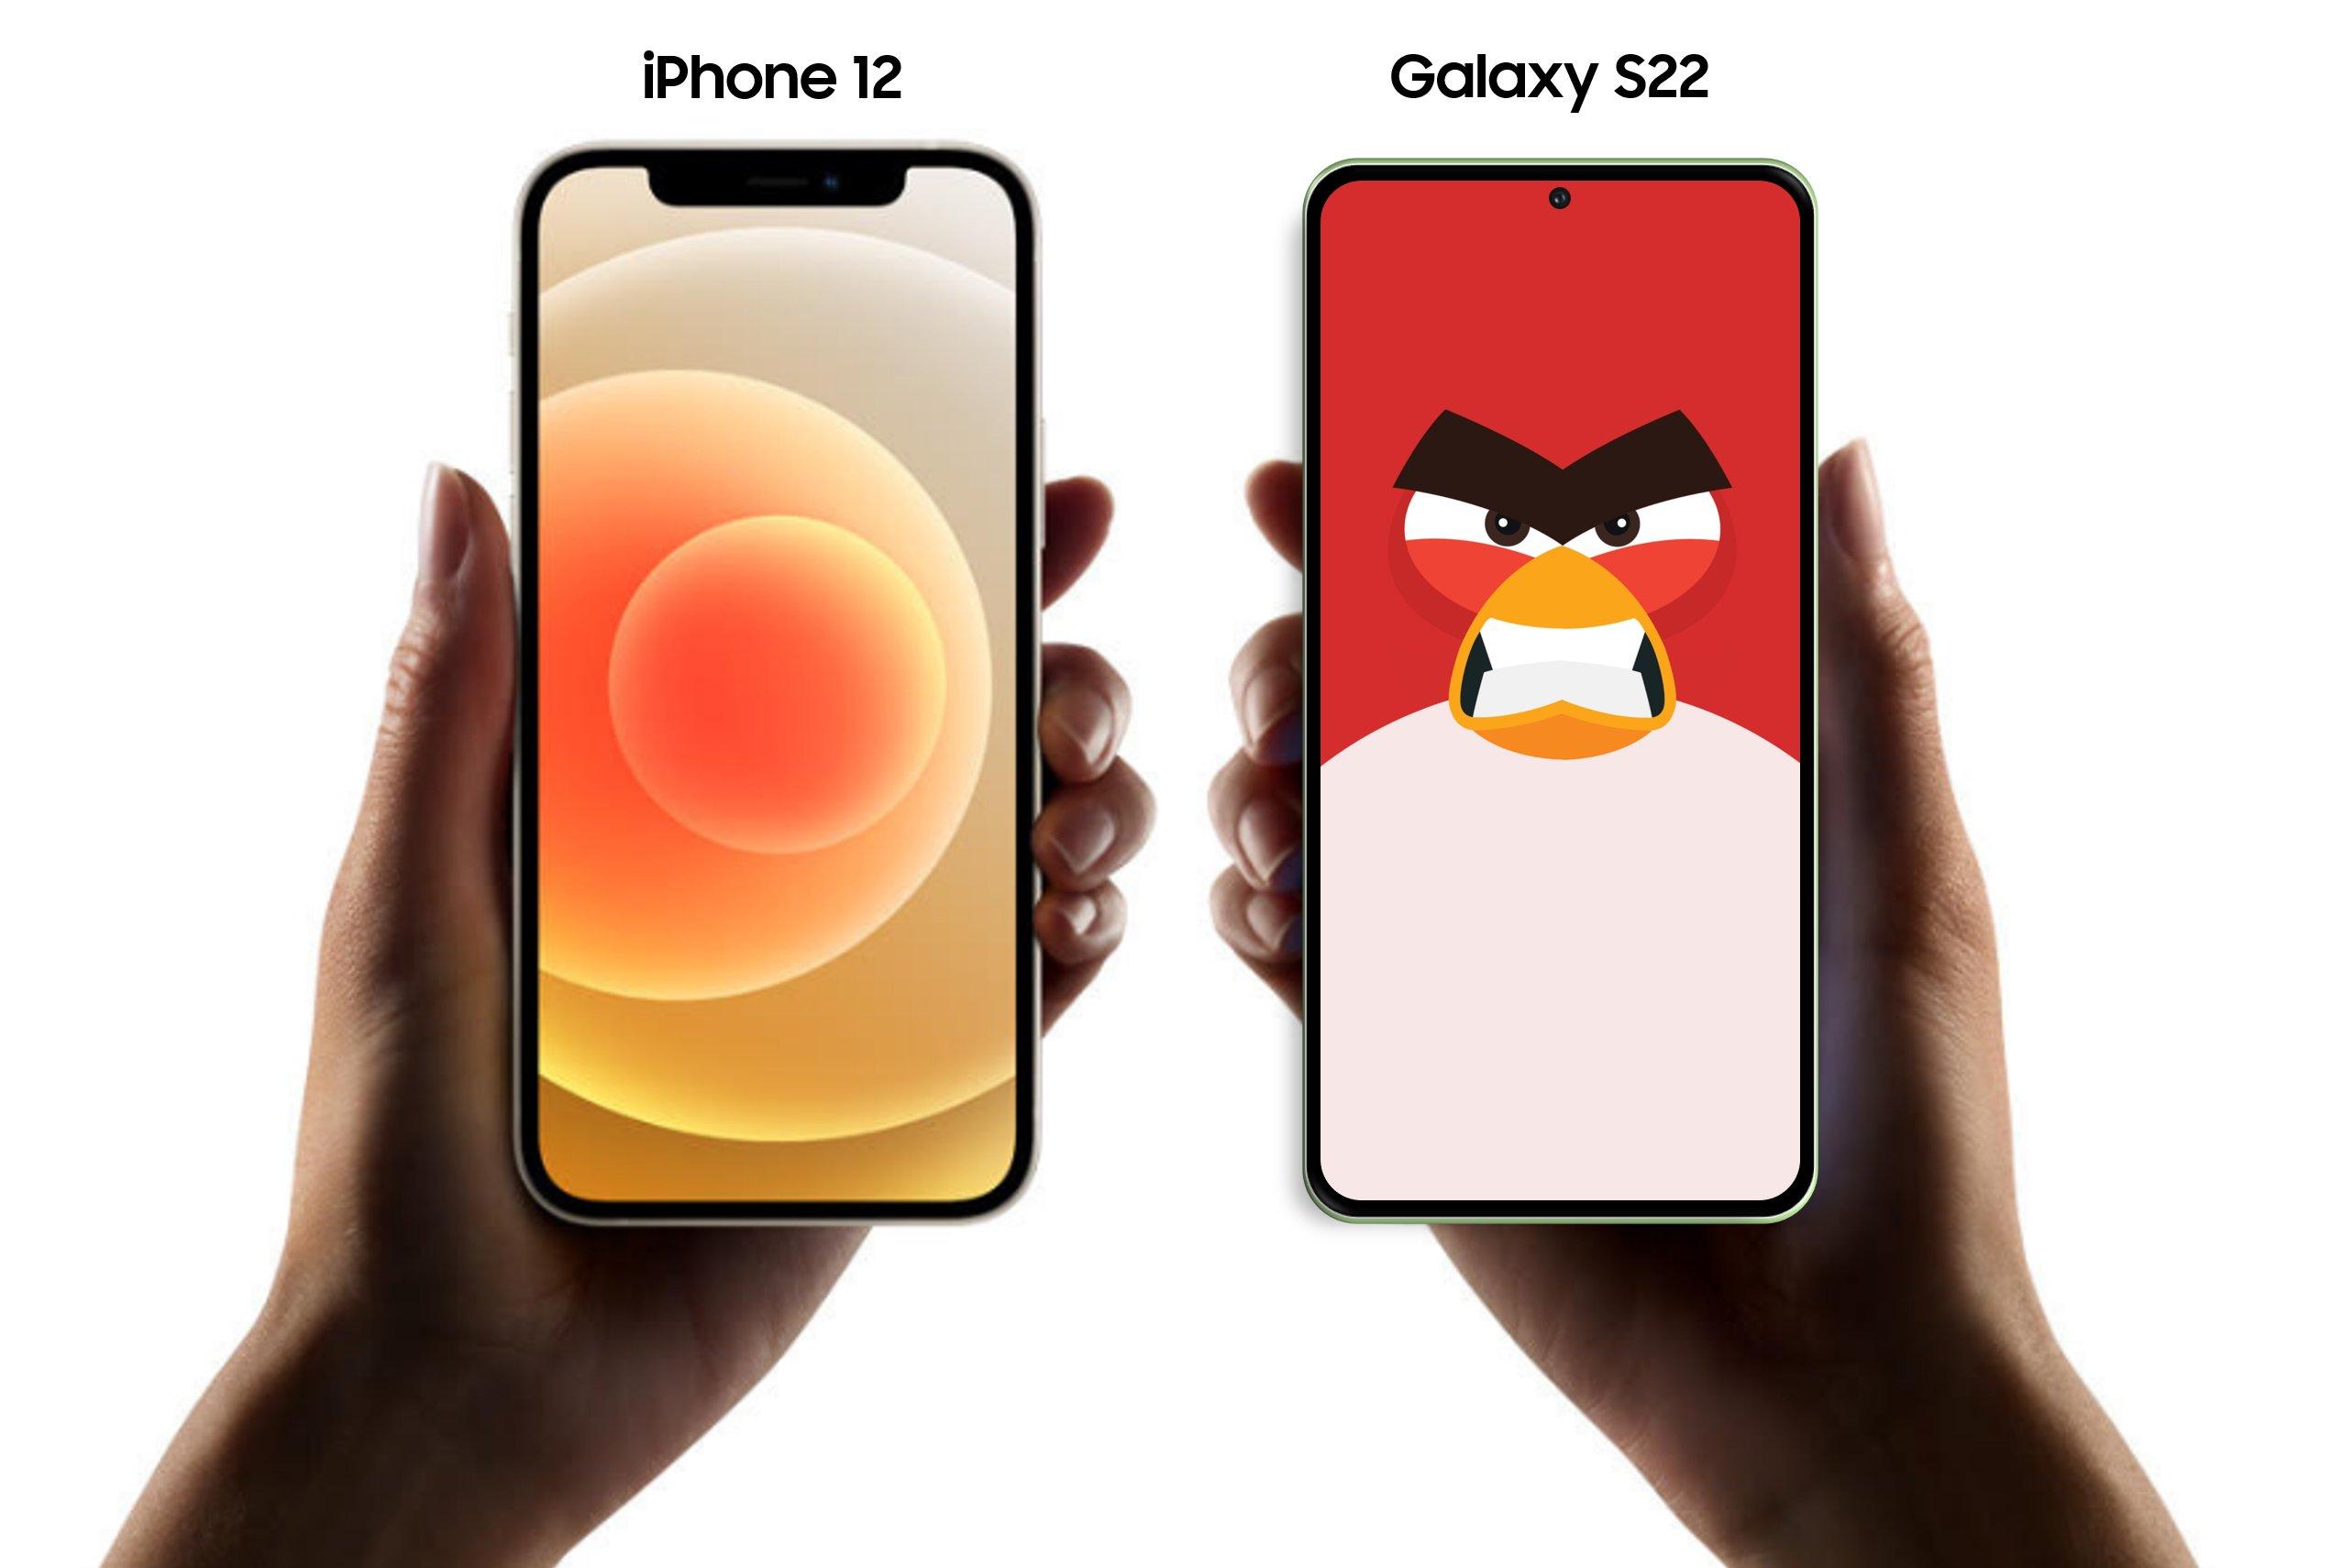 Så stor kan Samsung Galaxy S22 bli mot iPhone 12